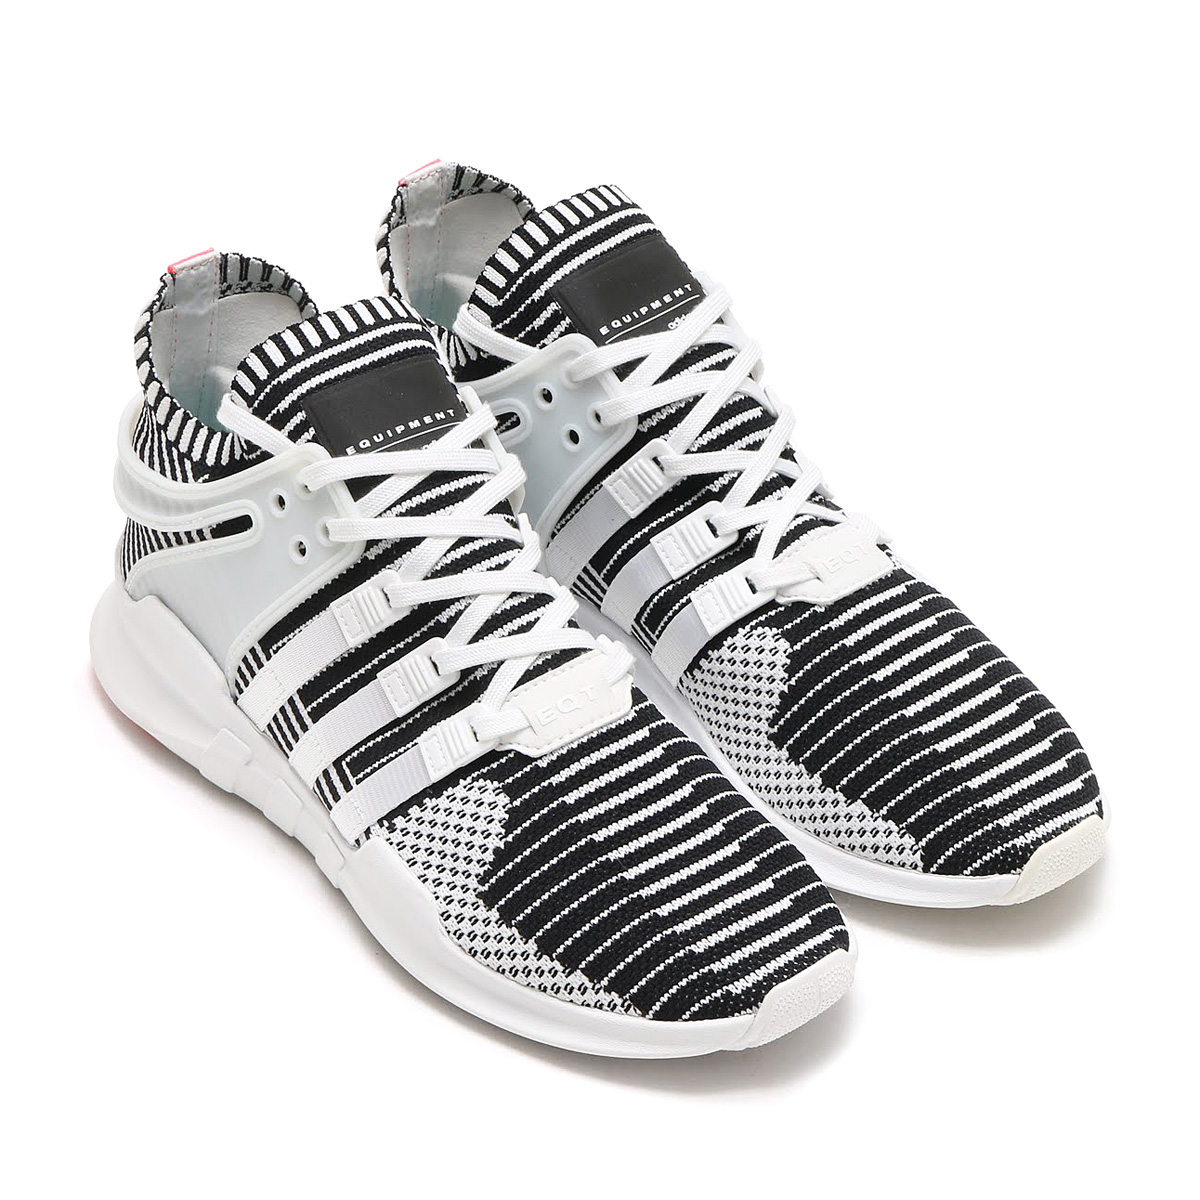 adidas Originals EQT SUPPORT ADV PK(アディダス オリジナルス エキップメント サポート) RUNNING WHITE/RUNNING WHITE/TURBO【メンズ スニーカー】17SS-I